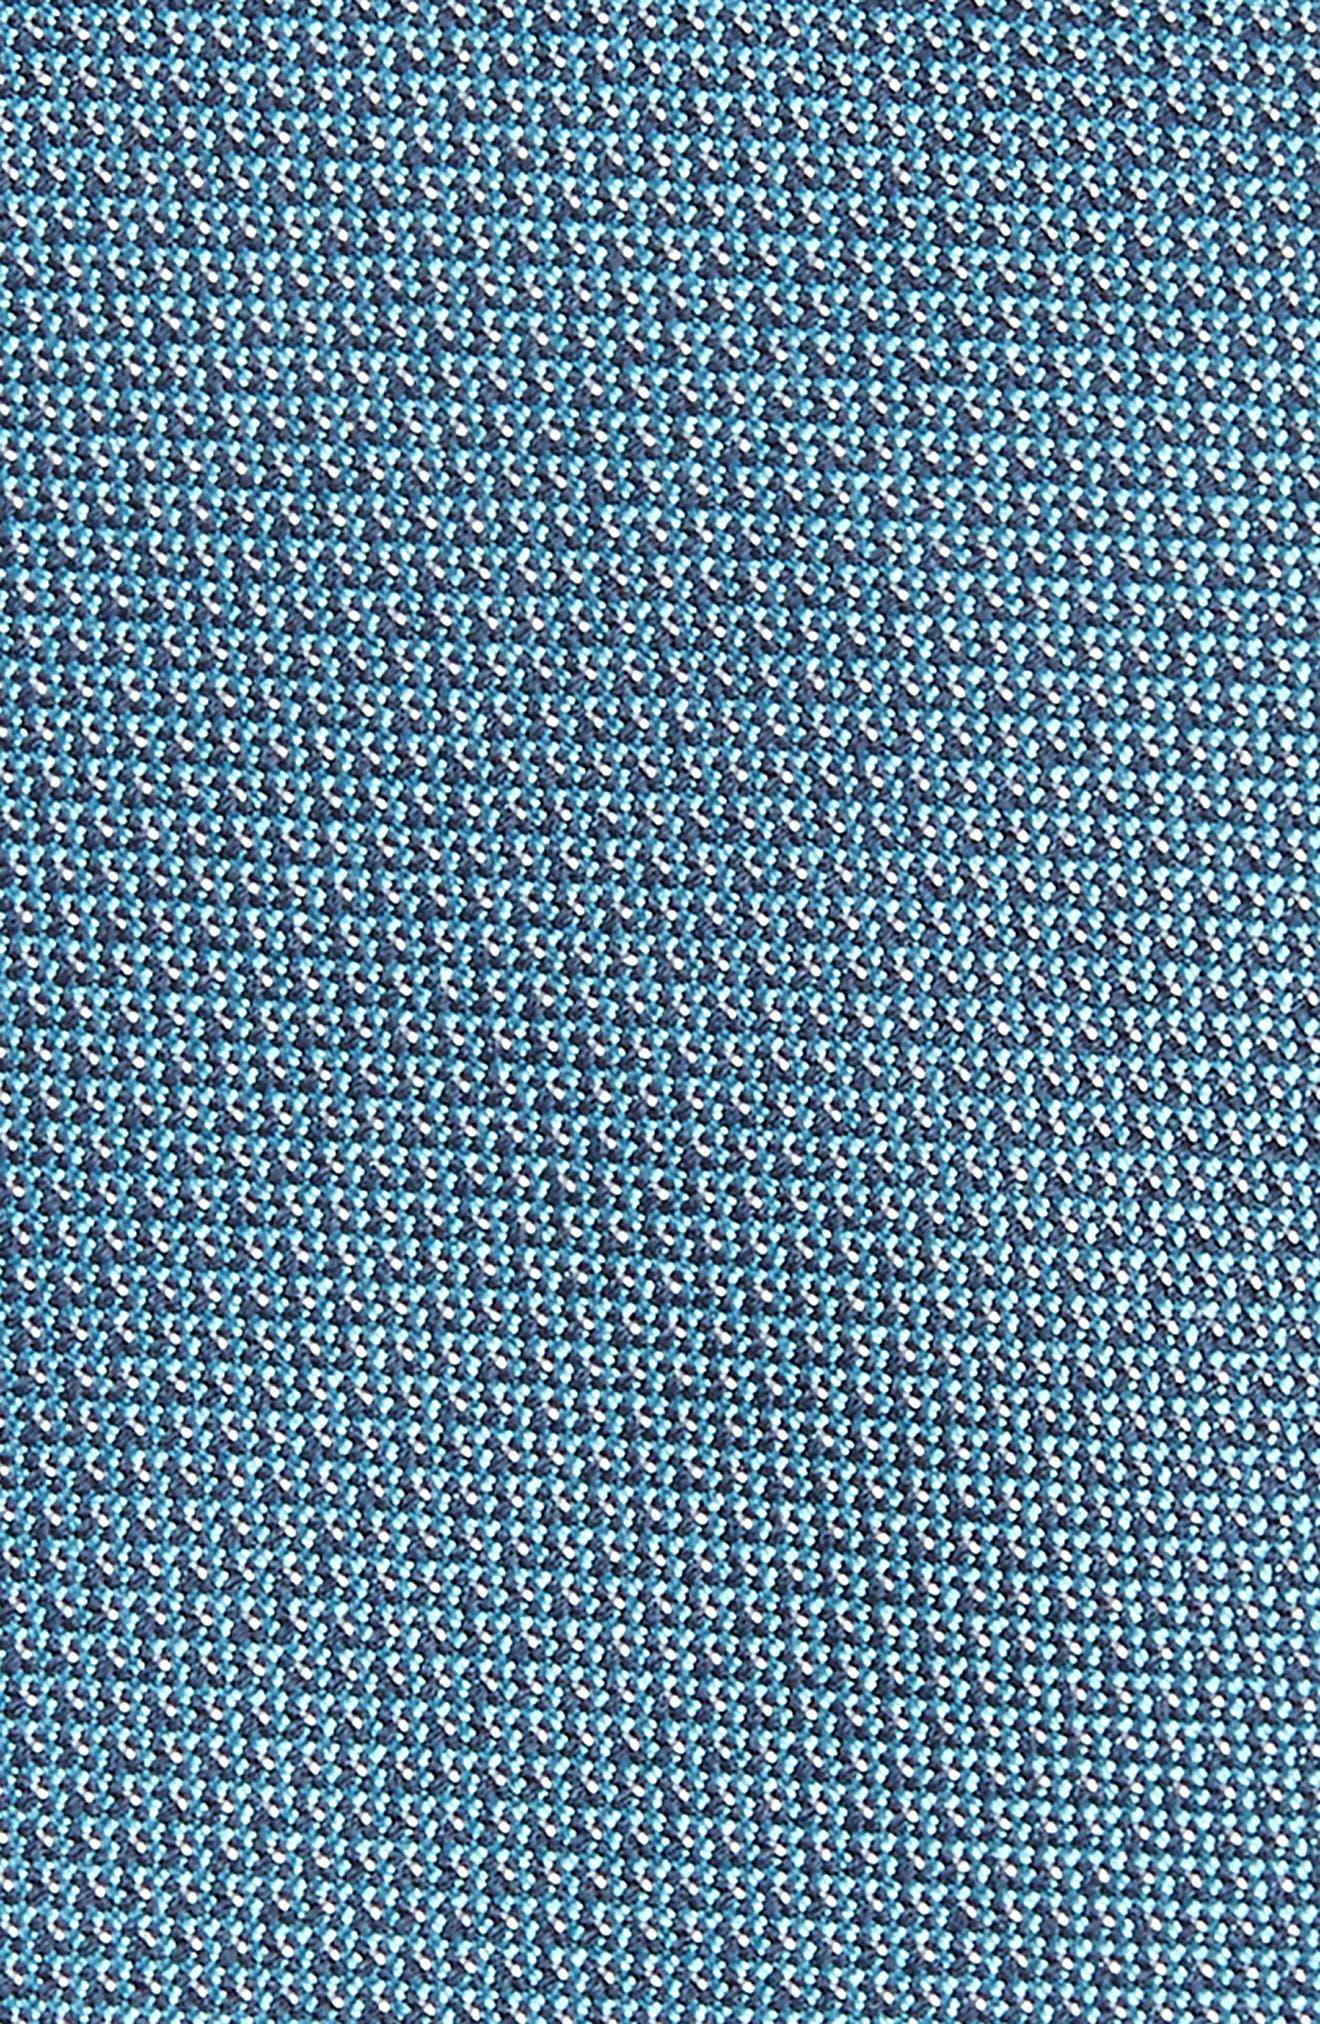 Eternity Unsolid Solid Silk Skinny Tie,                             Alternate thumbnail 2, color,                             Aqua/ Teal